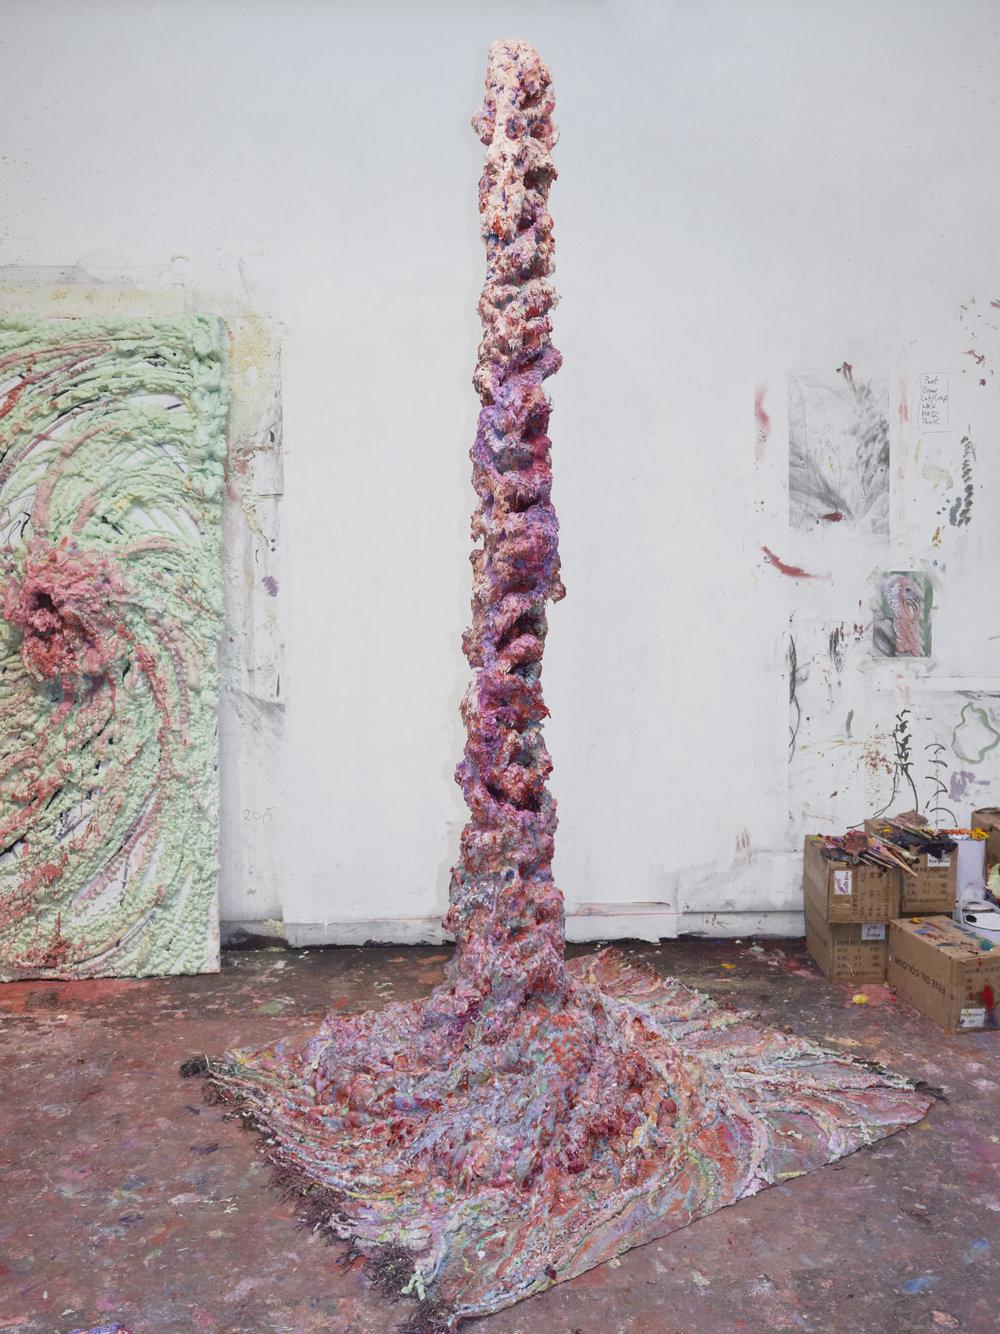 Genesis,2019   Oil, gesso, acrylic, polyurethane foam, wooden structure on carpet  255x24x20 x 146x130 cm